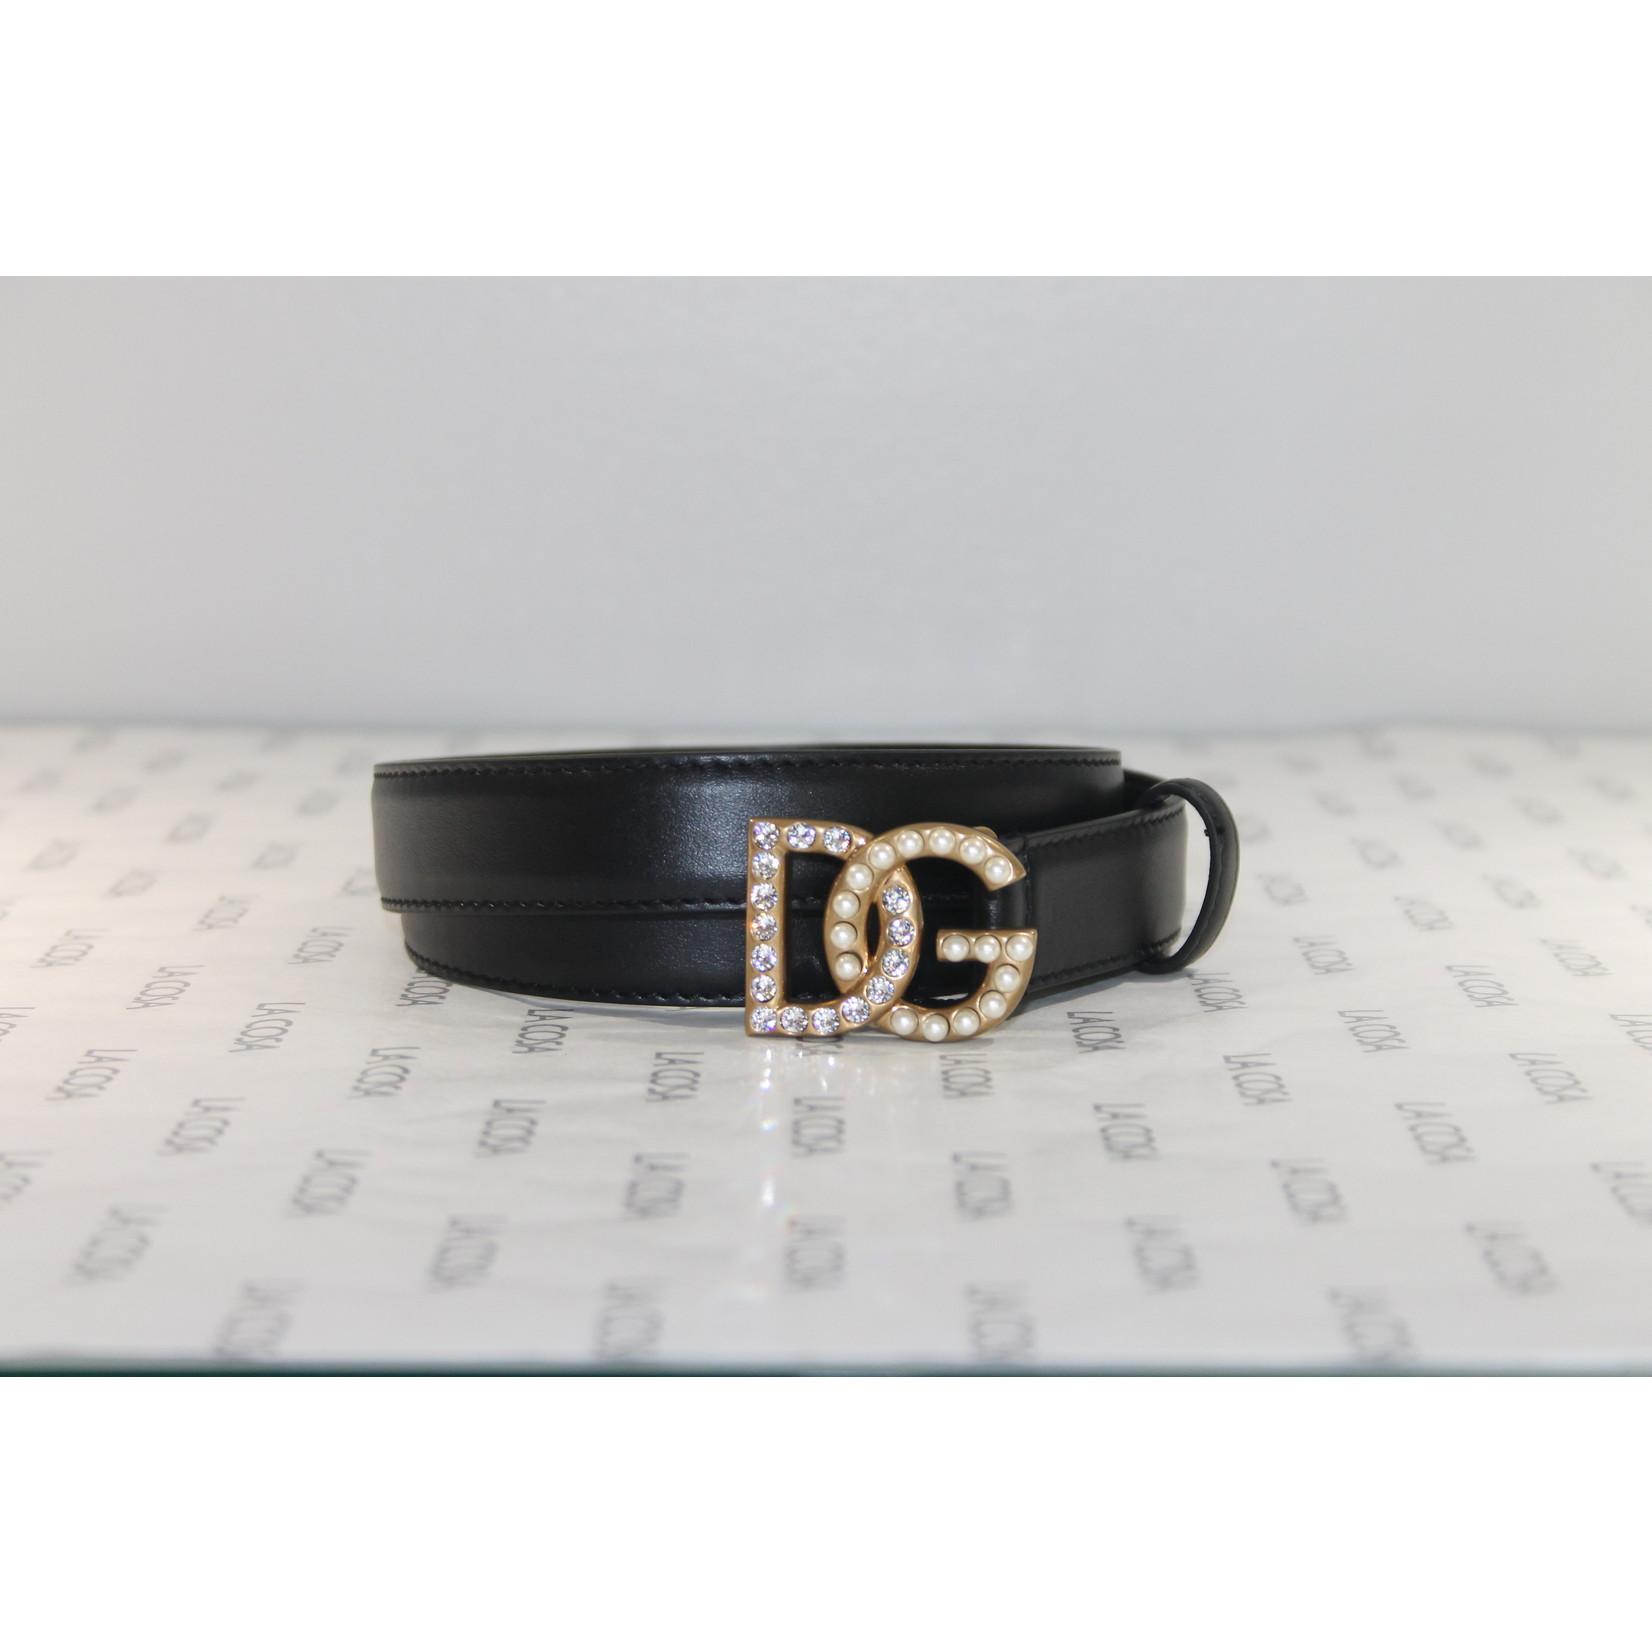 Dolce&Gabbana Riemen Riemen 42988